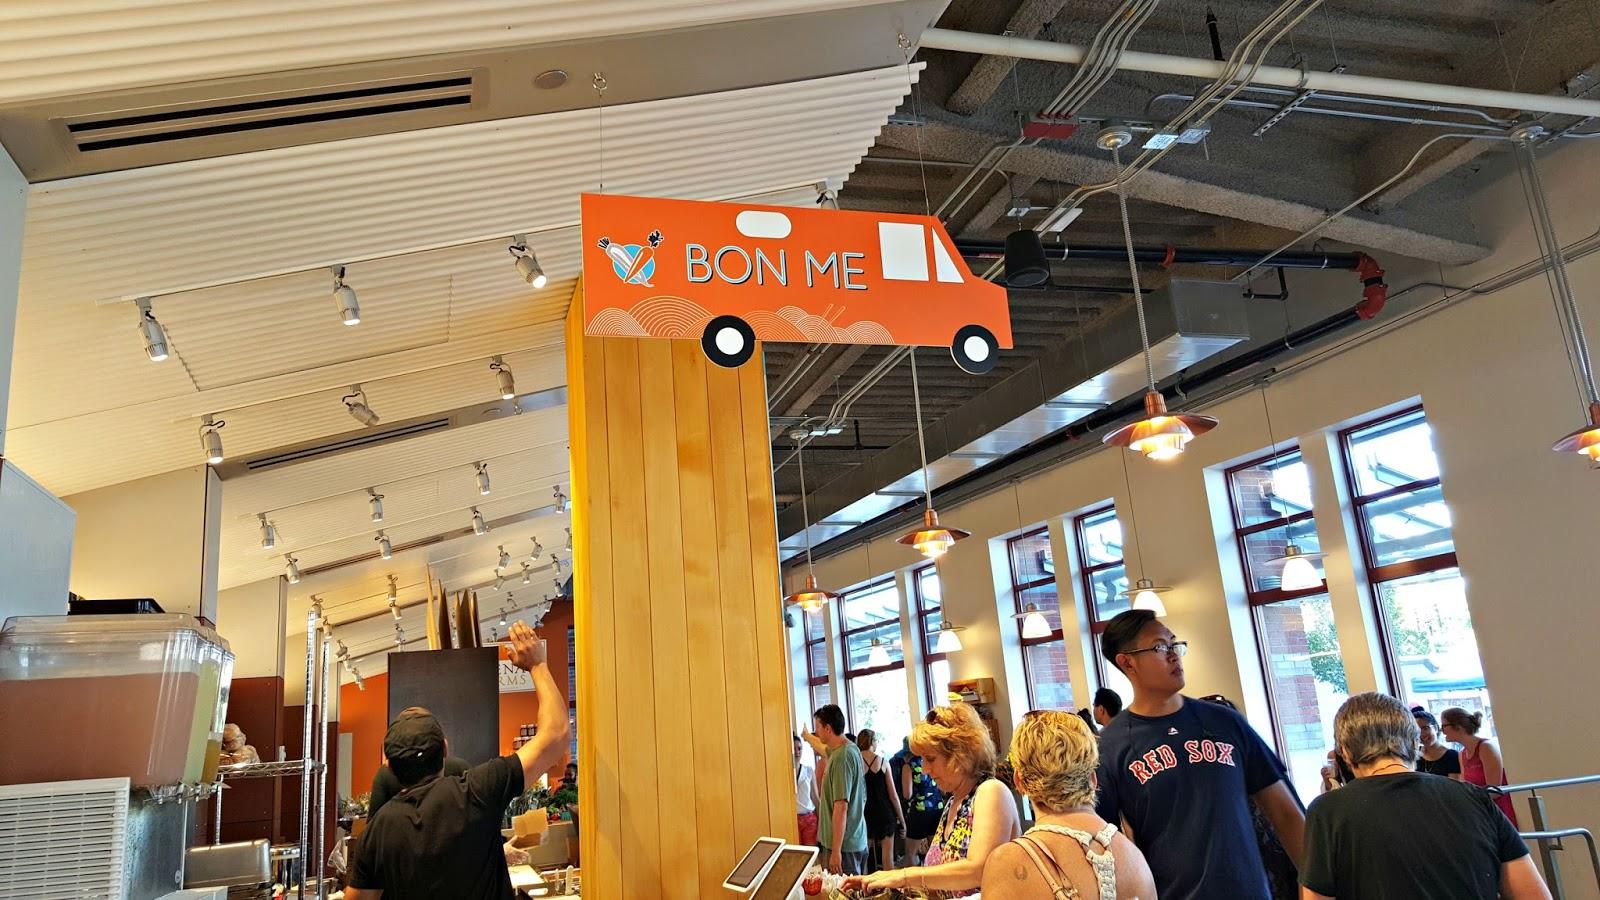 bon me boston public market.jpg